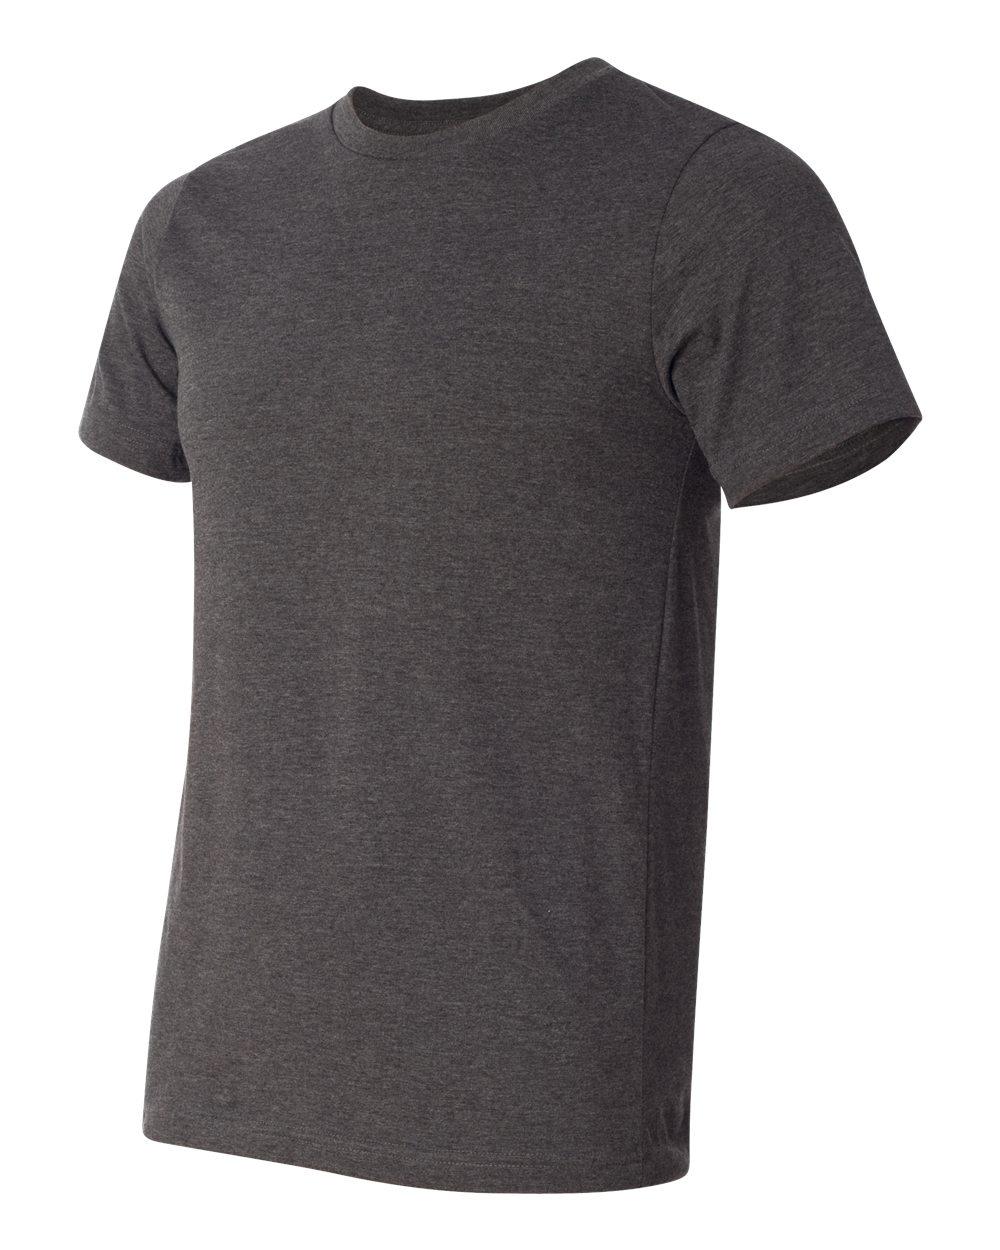 Bella-Canvas-Unisex-Made-in-USA-Jersey-Short-Sleeve-T-Shirt-3001U-XS-3XL thumbnail 24